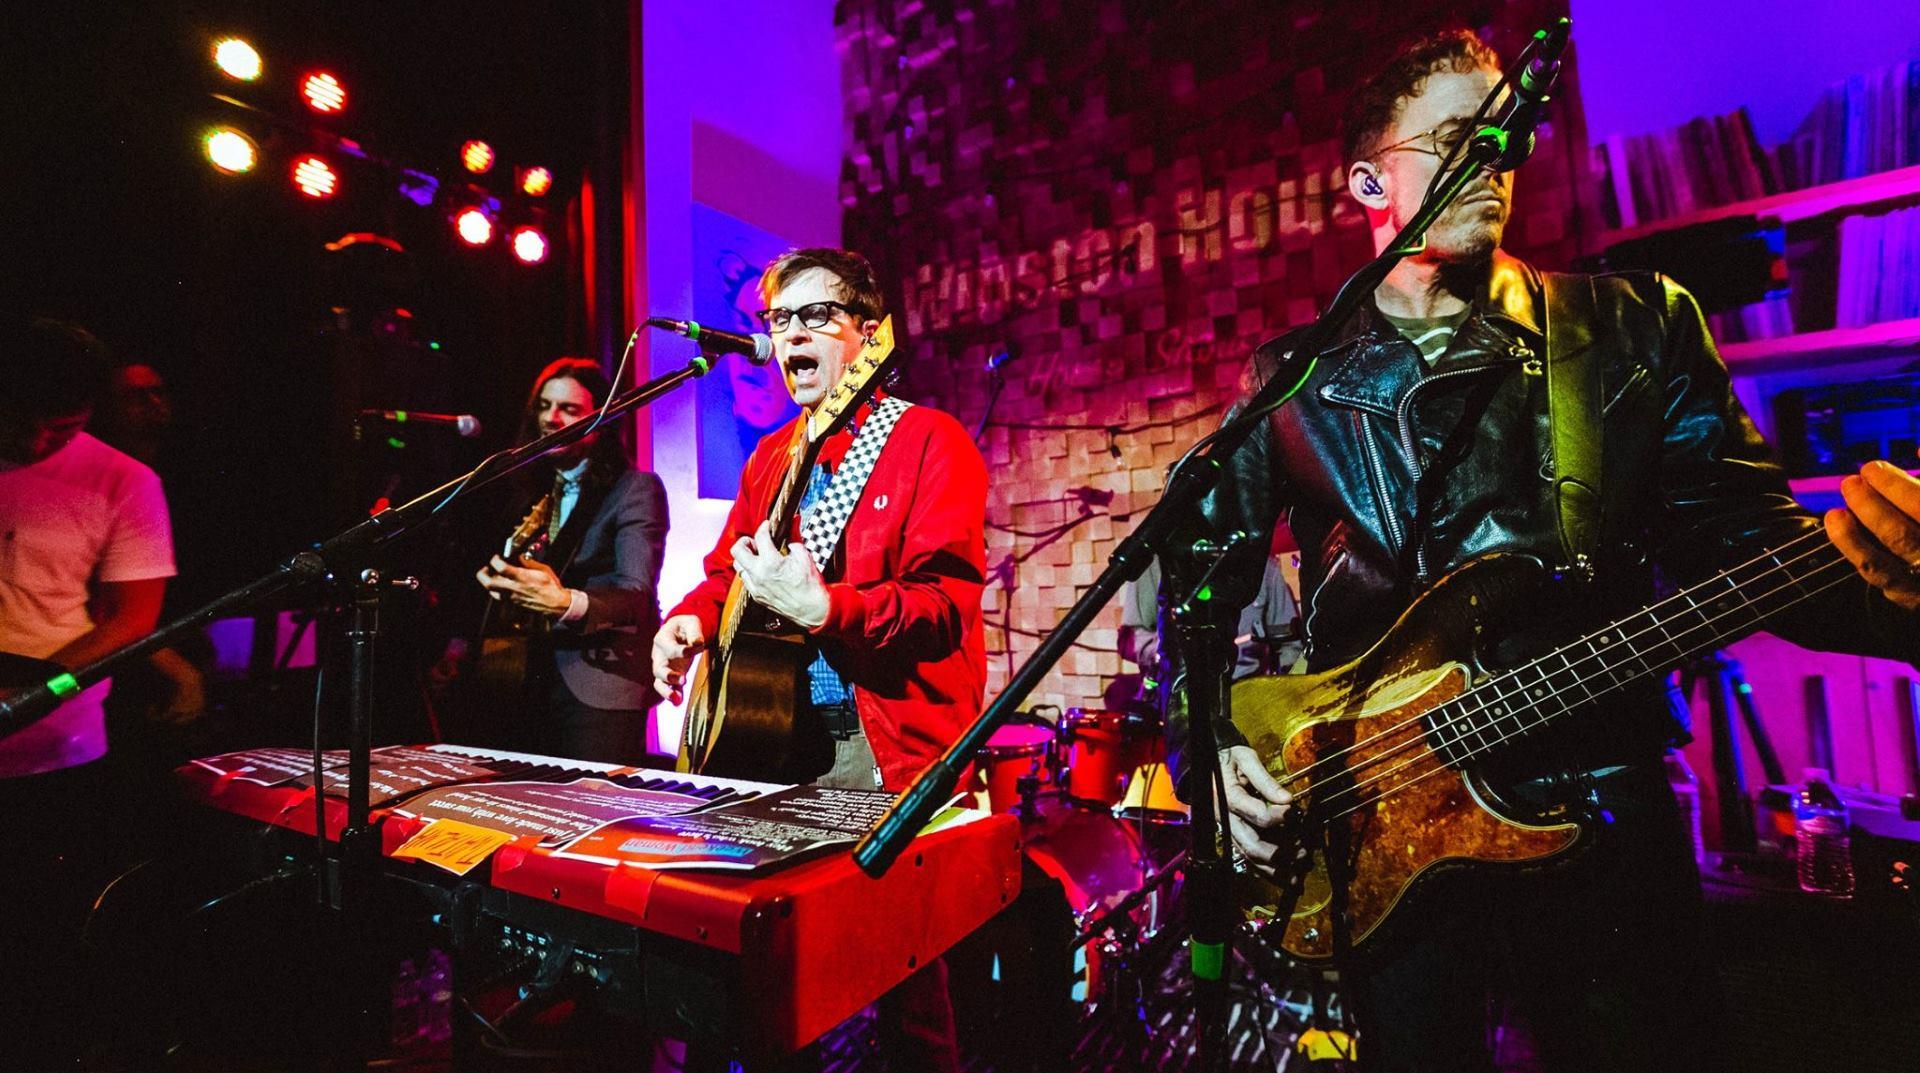 VIDEO: Grupa Weezer uskoro kreće na europsku turneju